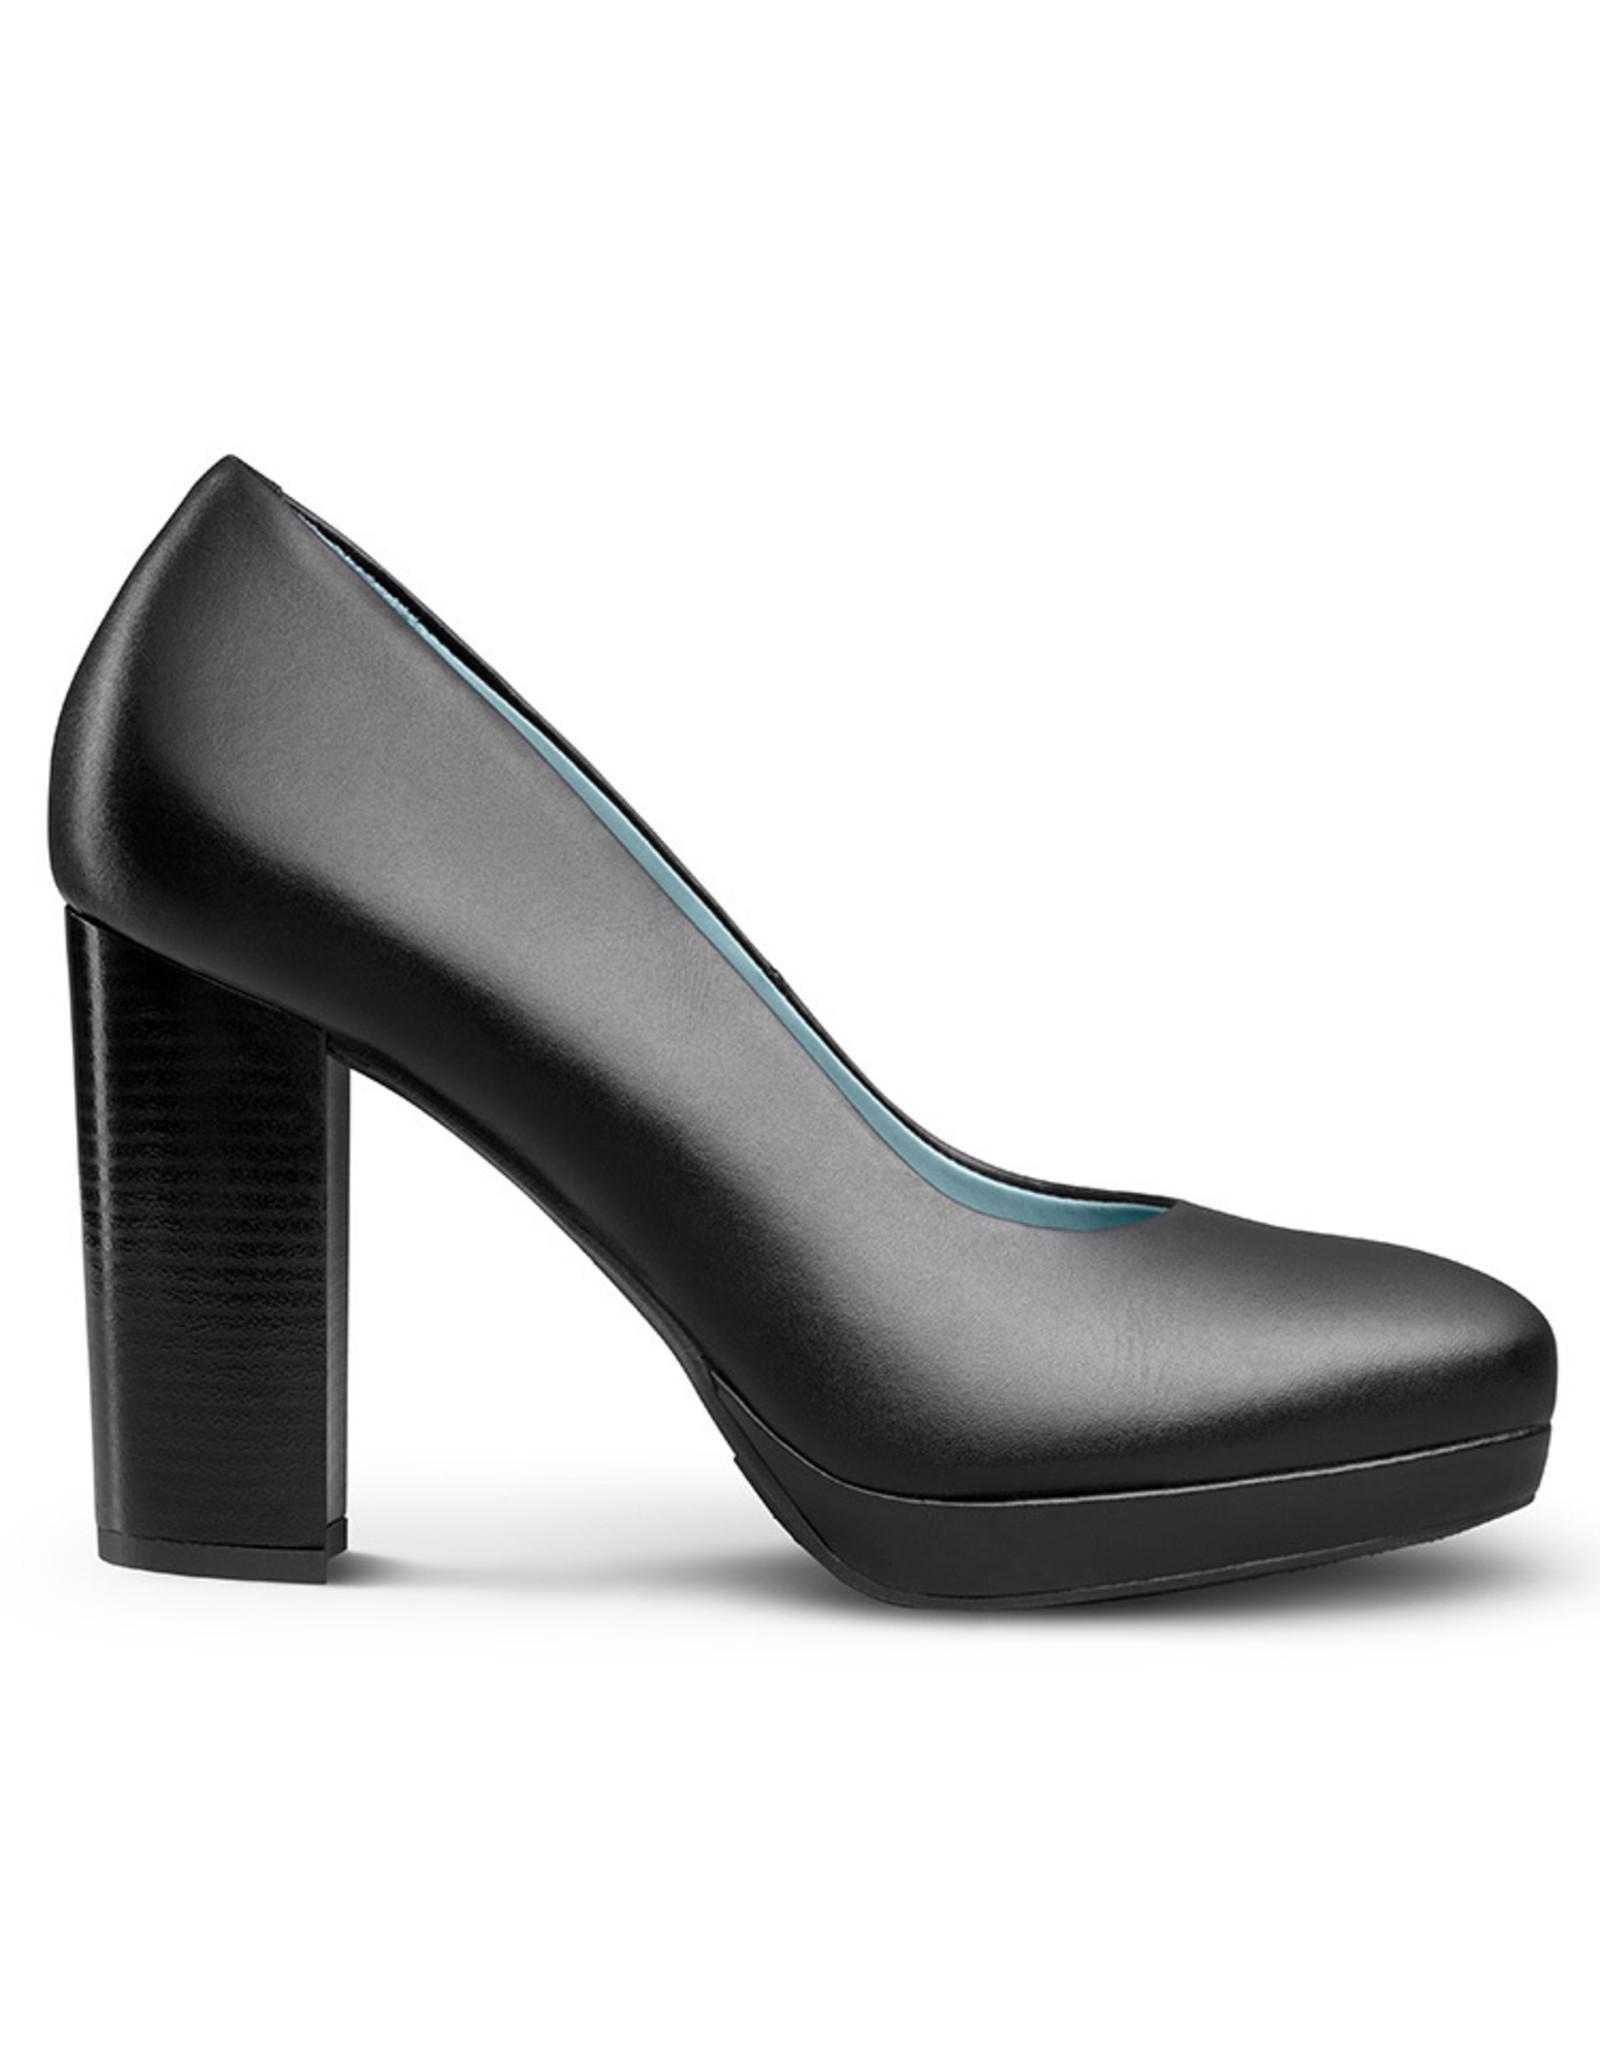 Skypro Stewardess schoenen Carole Middleton